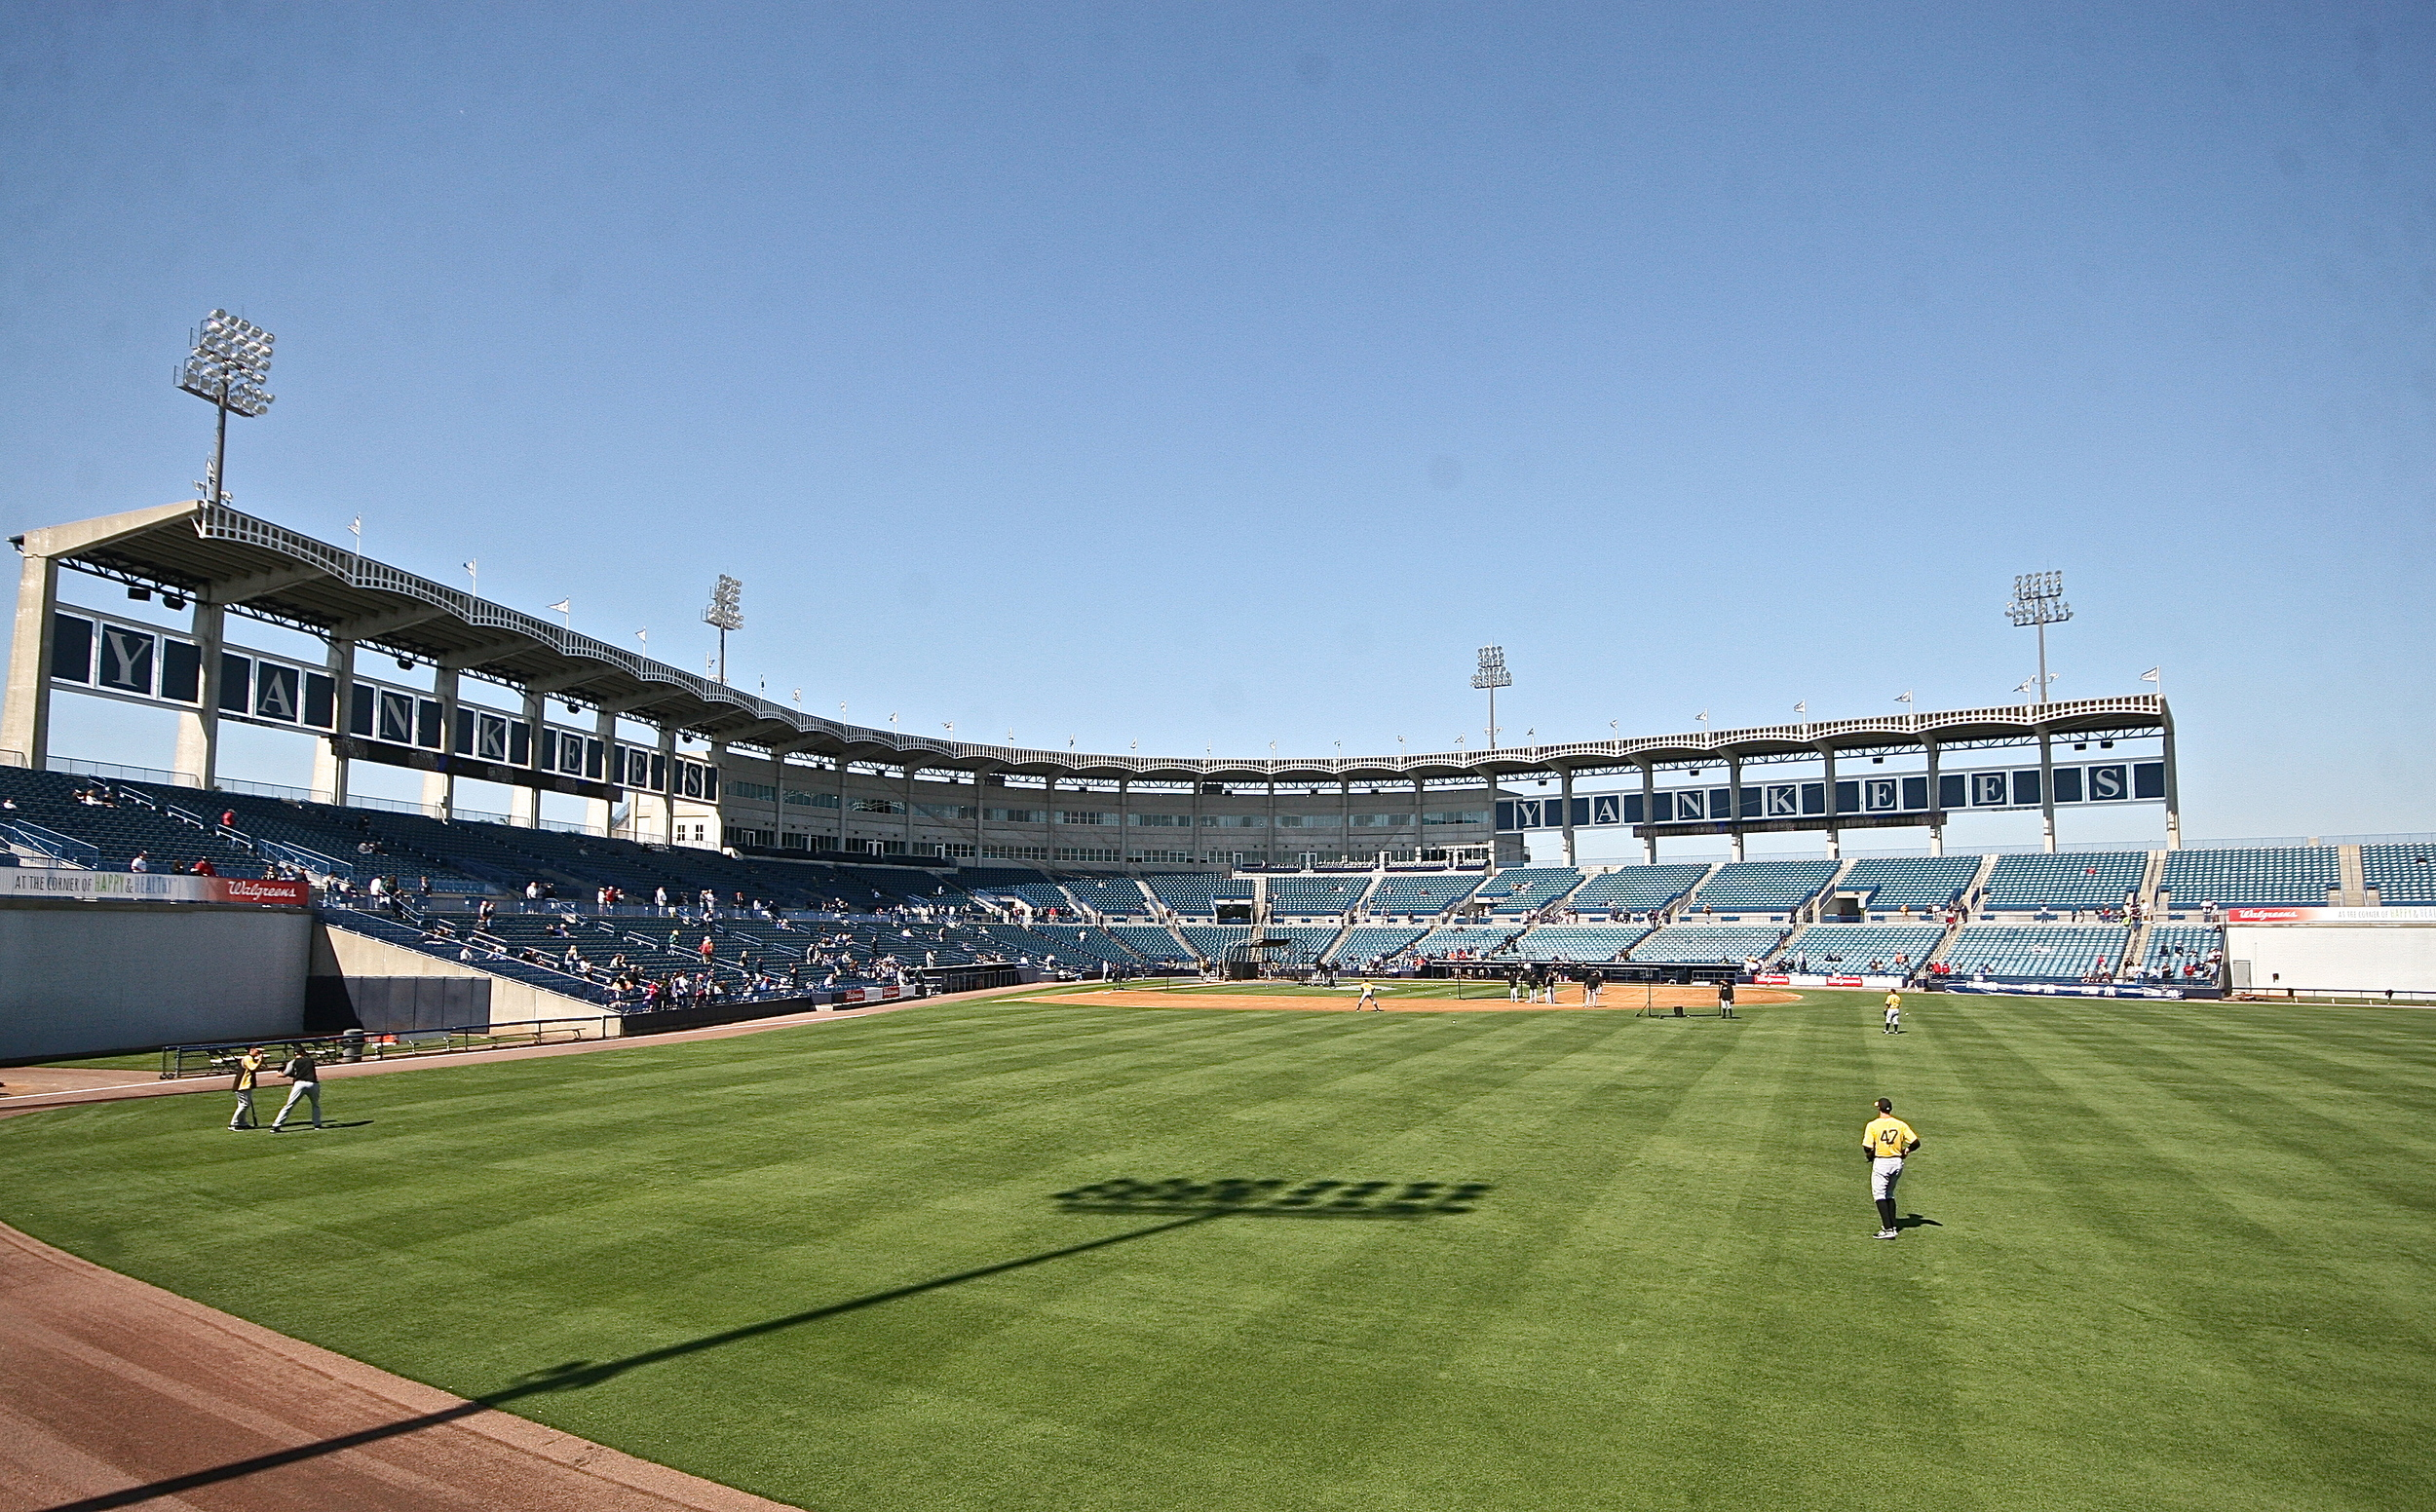 Steinbrenner Field, home of the New York Yankees